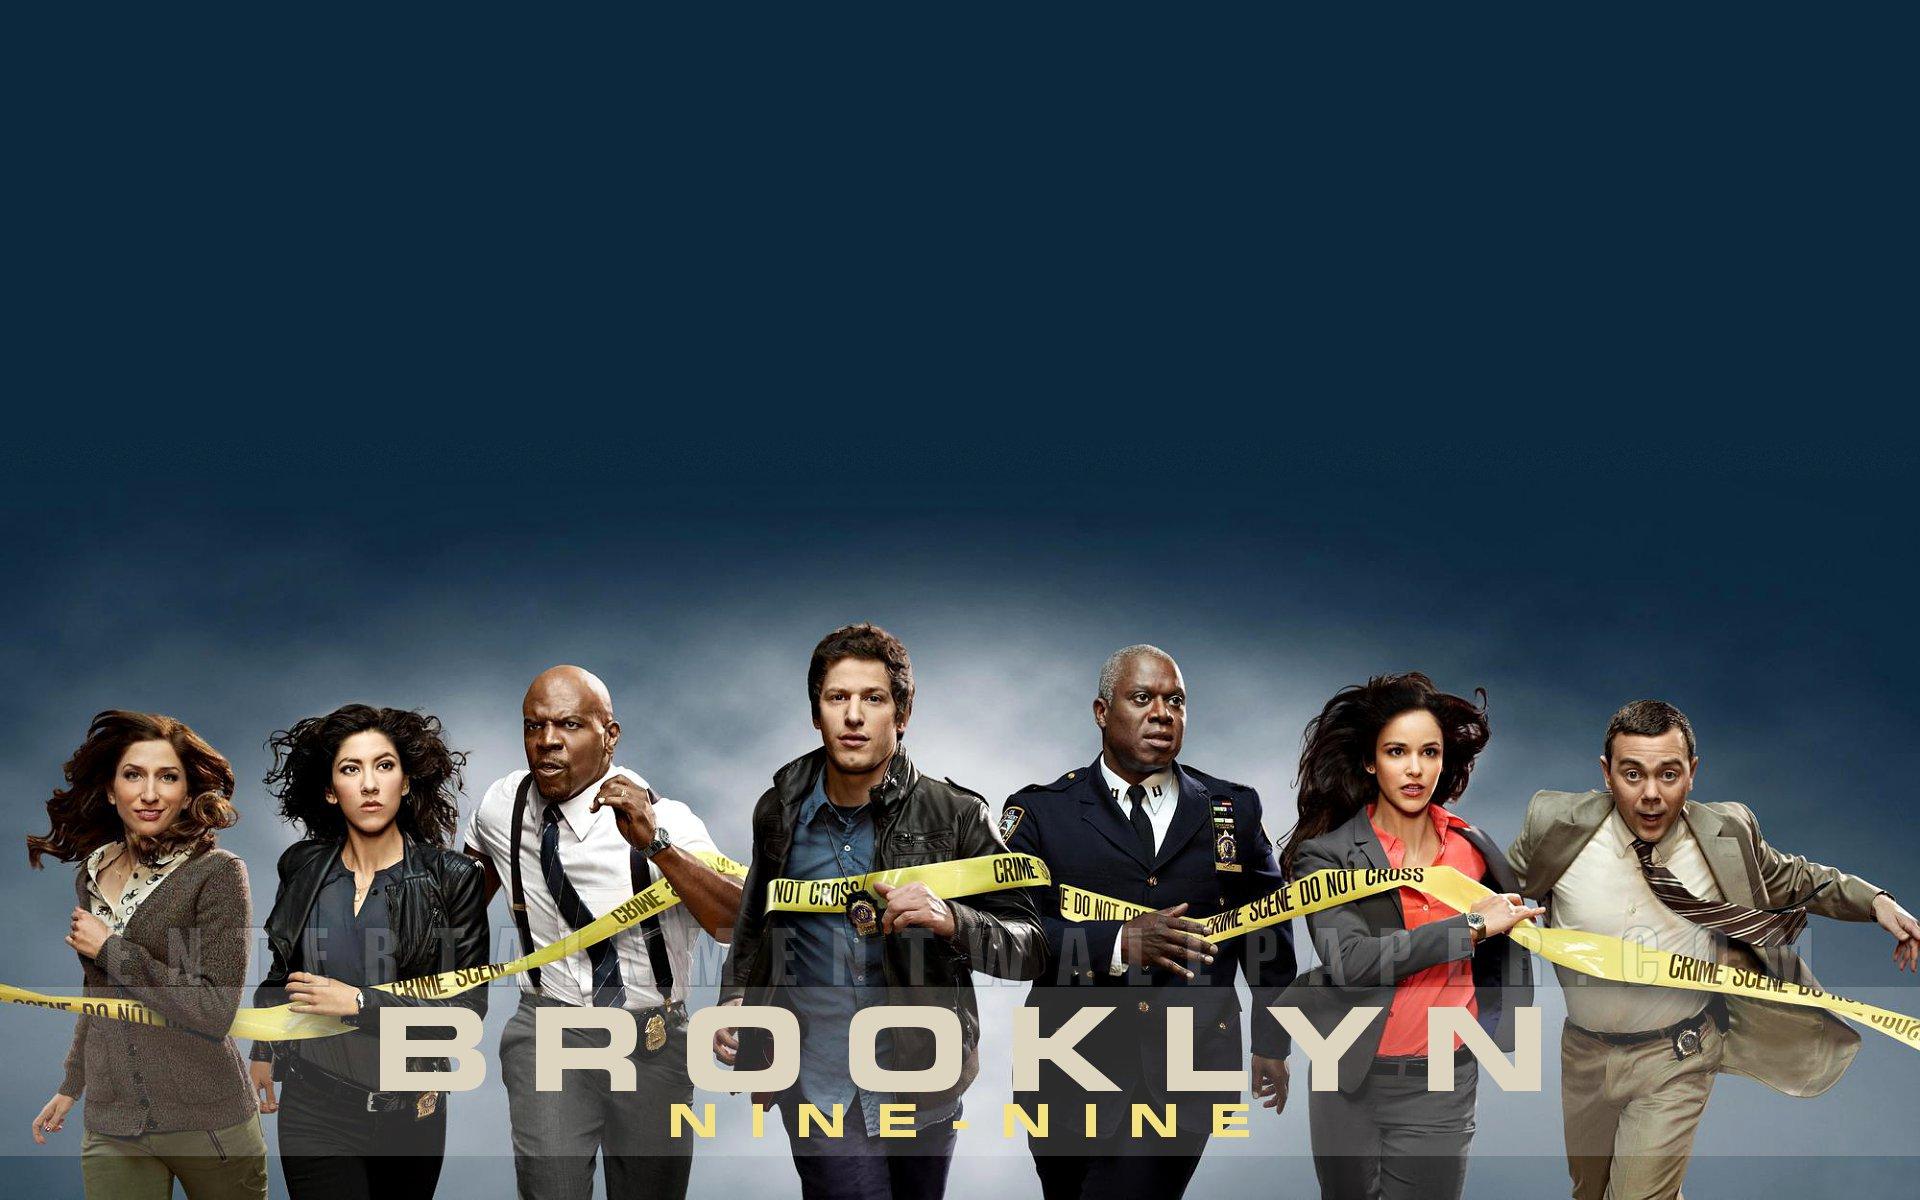 Brooklyn Nine Nine HD Wallpaper Background Image 1920x1200 1920x1200